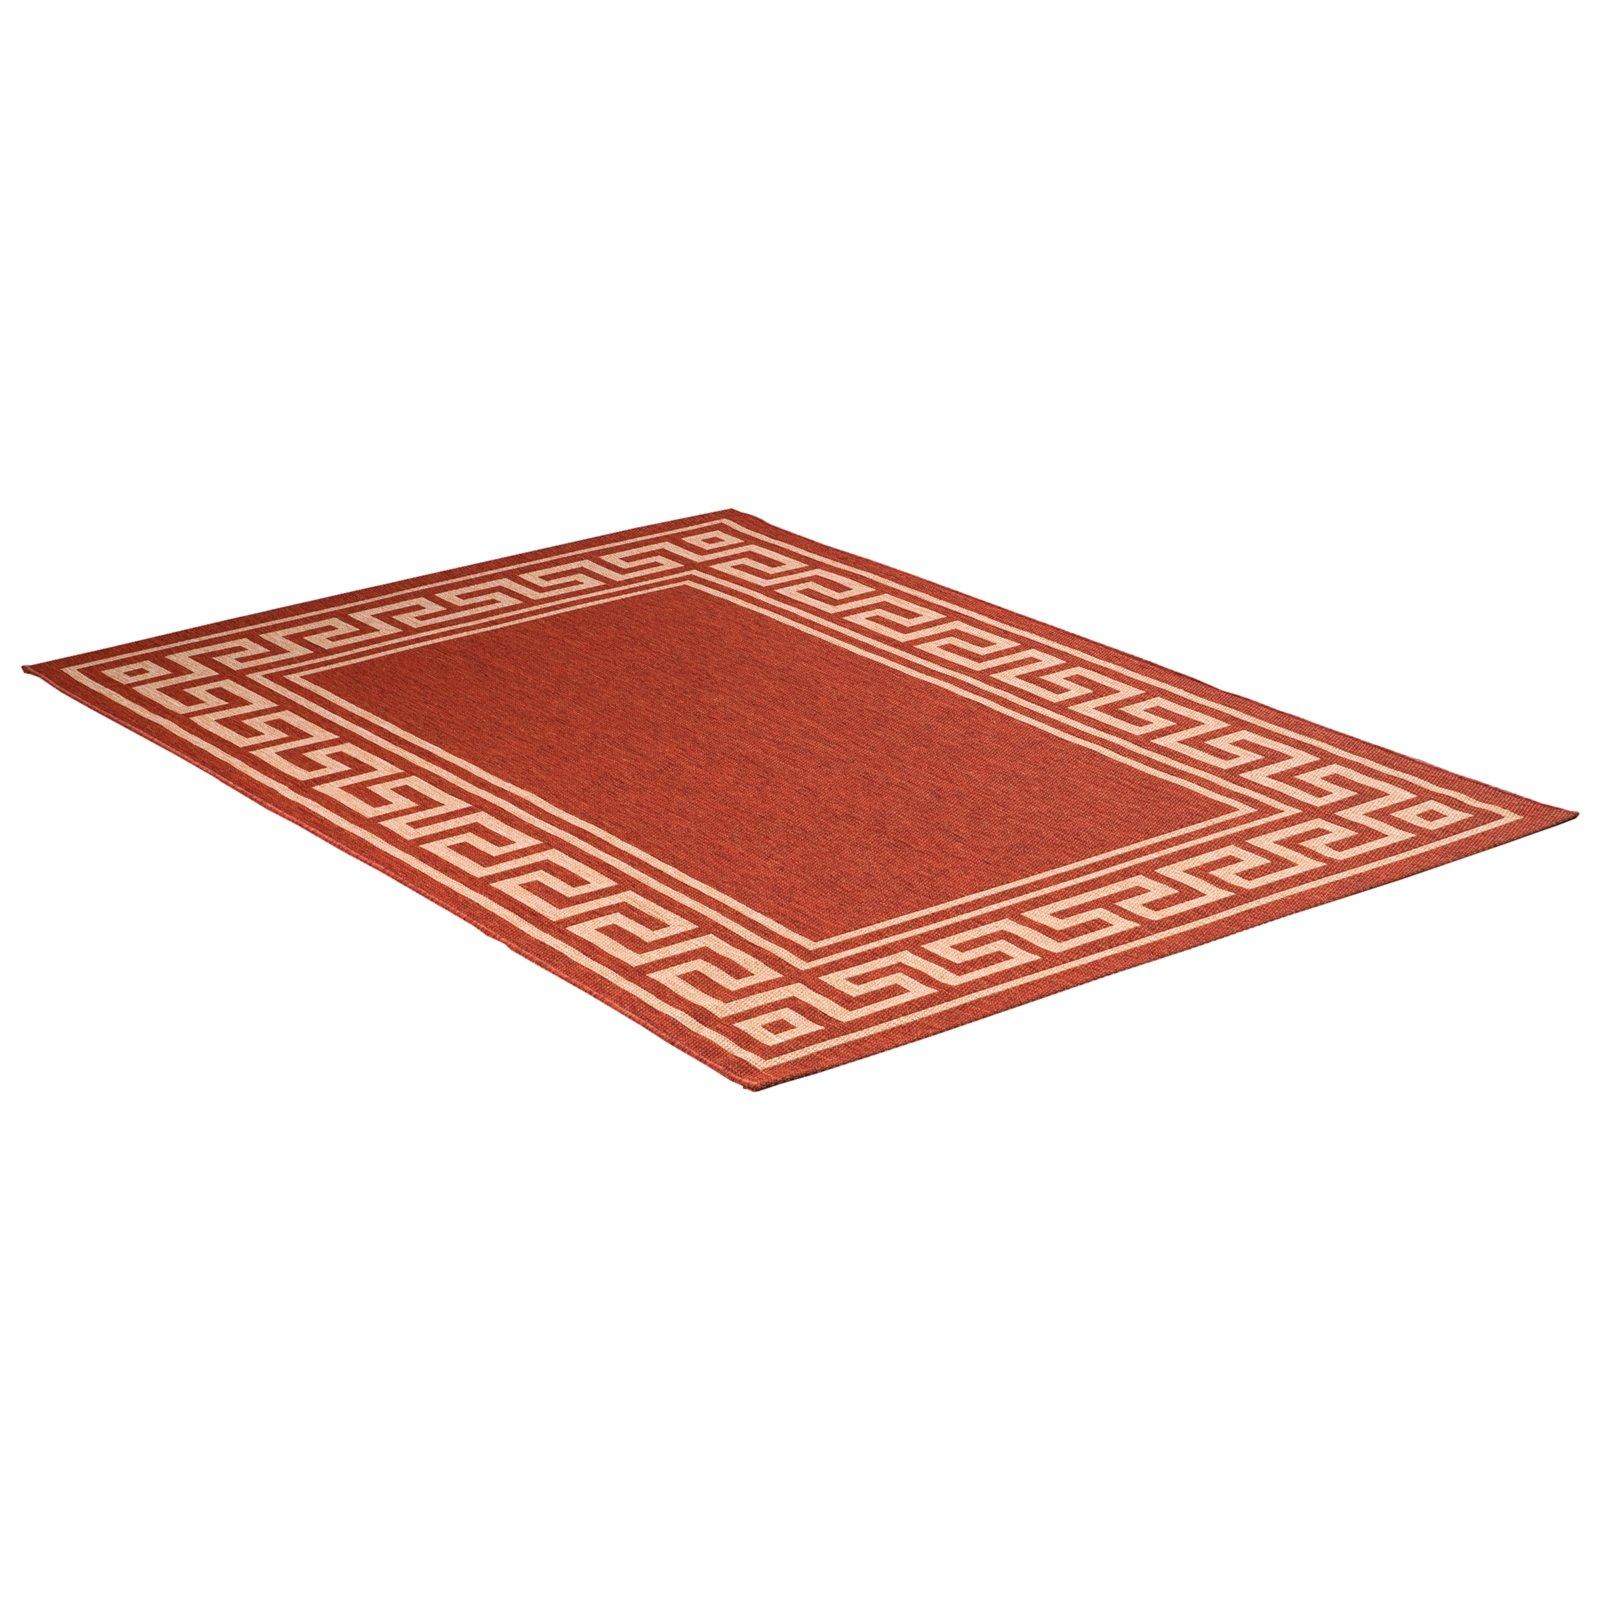 teppich oslo terracotta 80x240 cm gemusterte teppiche teppiche l ufer deko. Black Bedroom Furniture Sets. Home Design Ideas